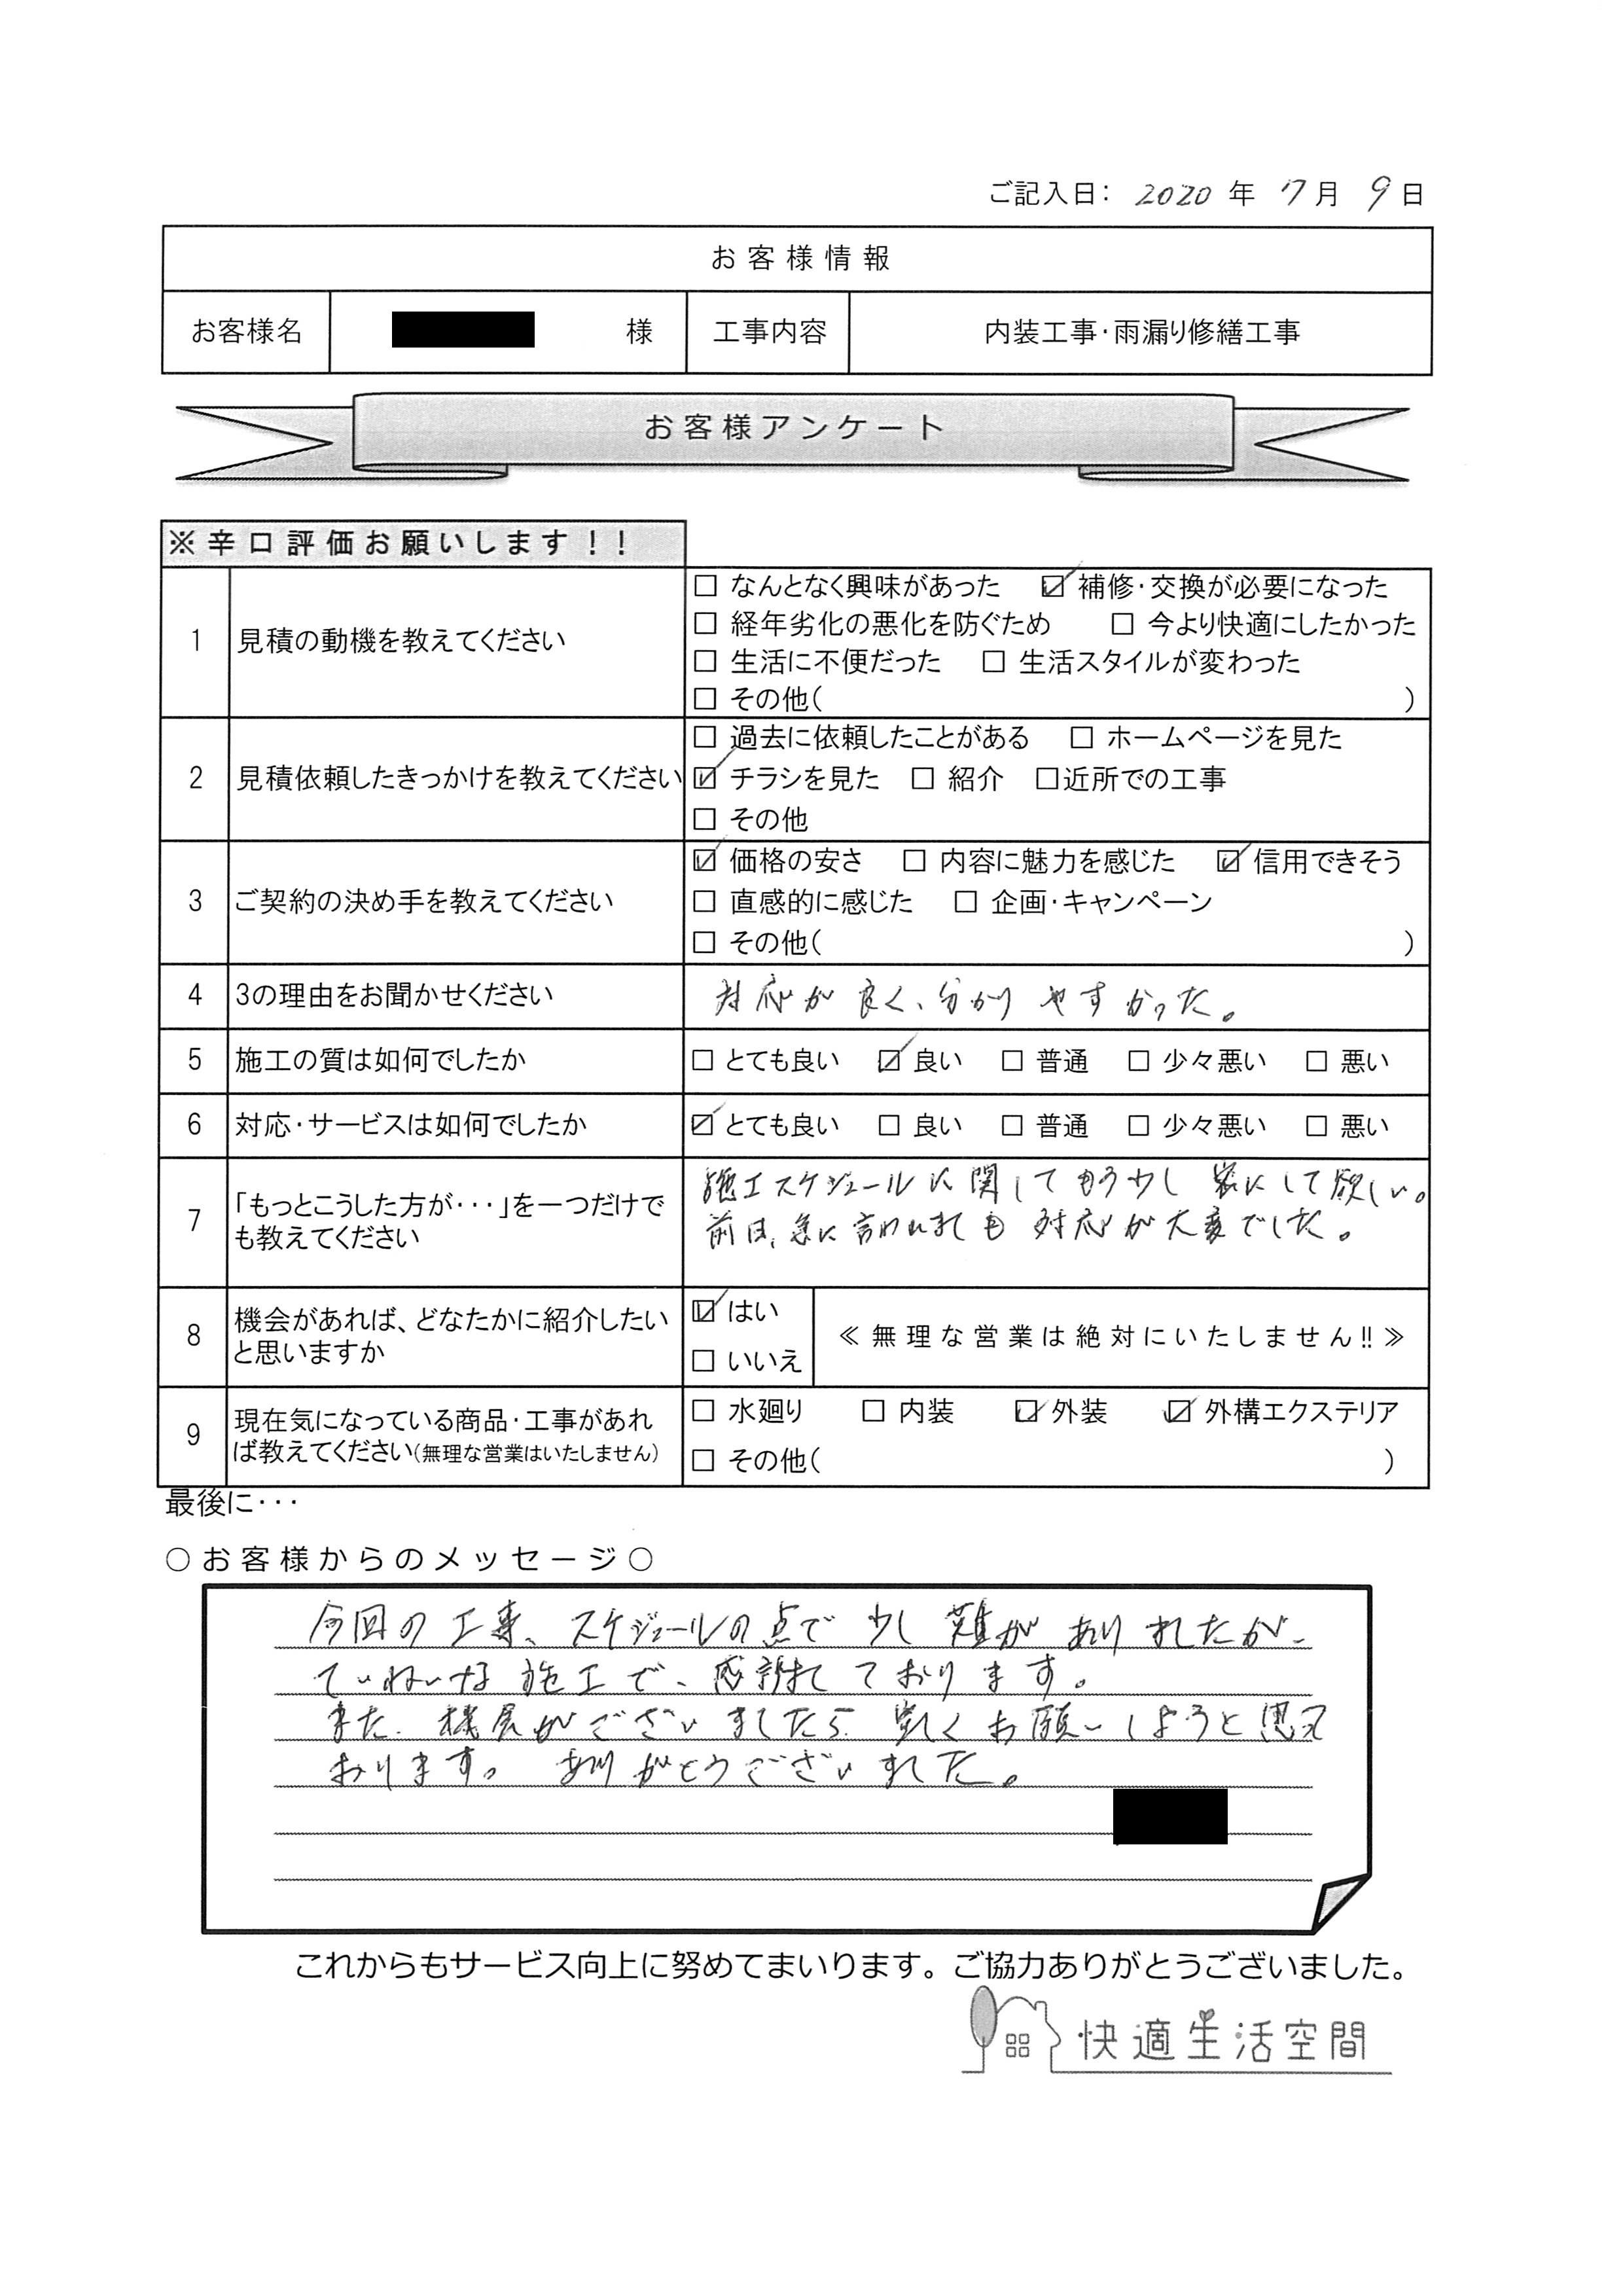 H様邸 内装工事・雨漏り修繕工事アンケート